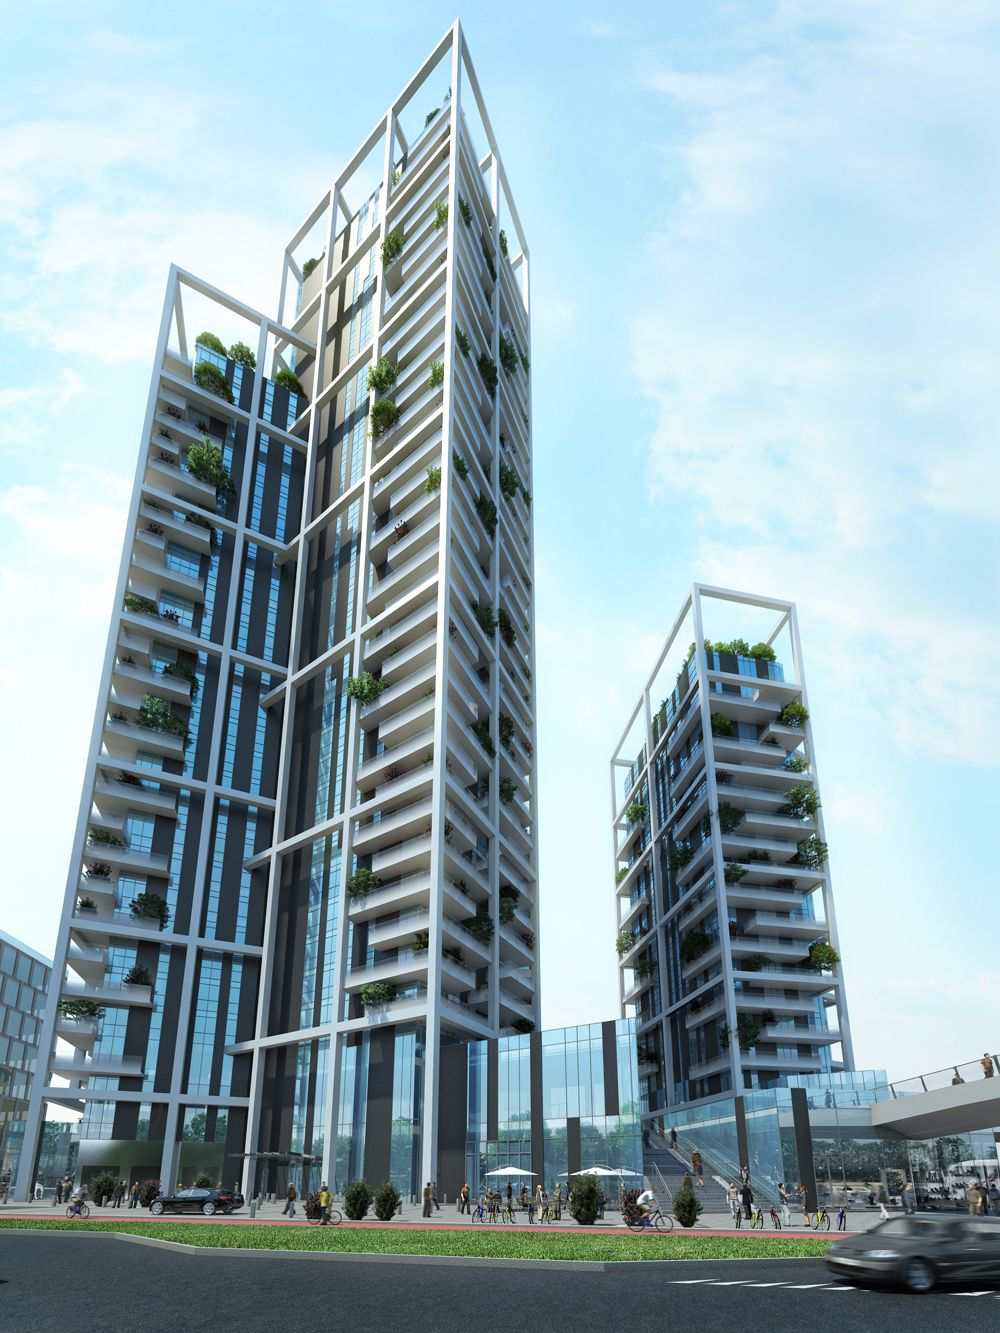 Porta nuova condominium arquitectonica ed - Via porta nuova milano ...